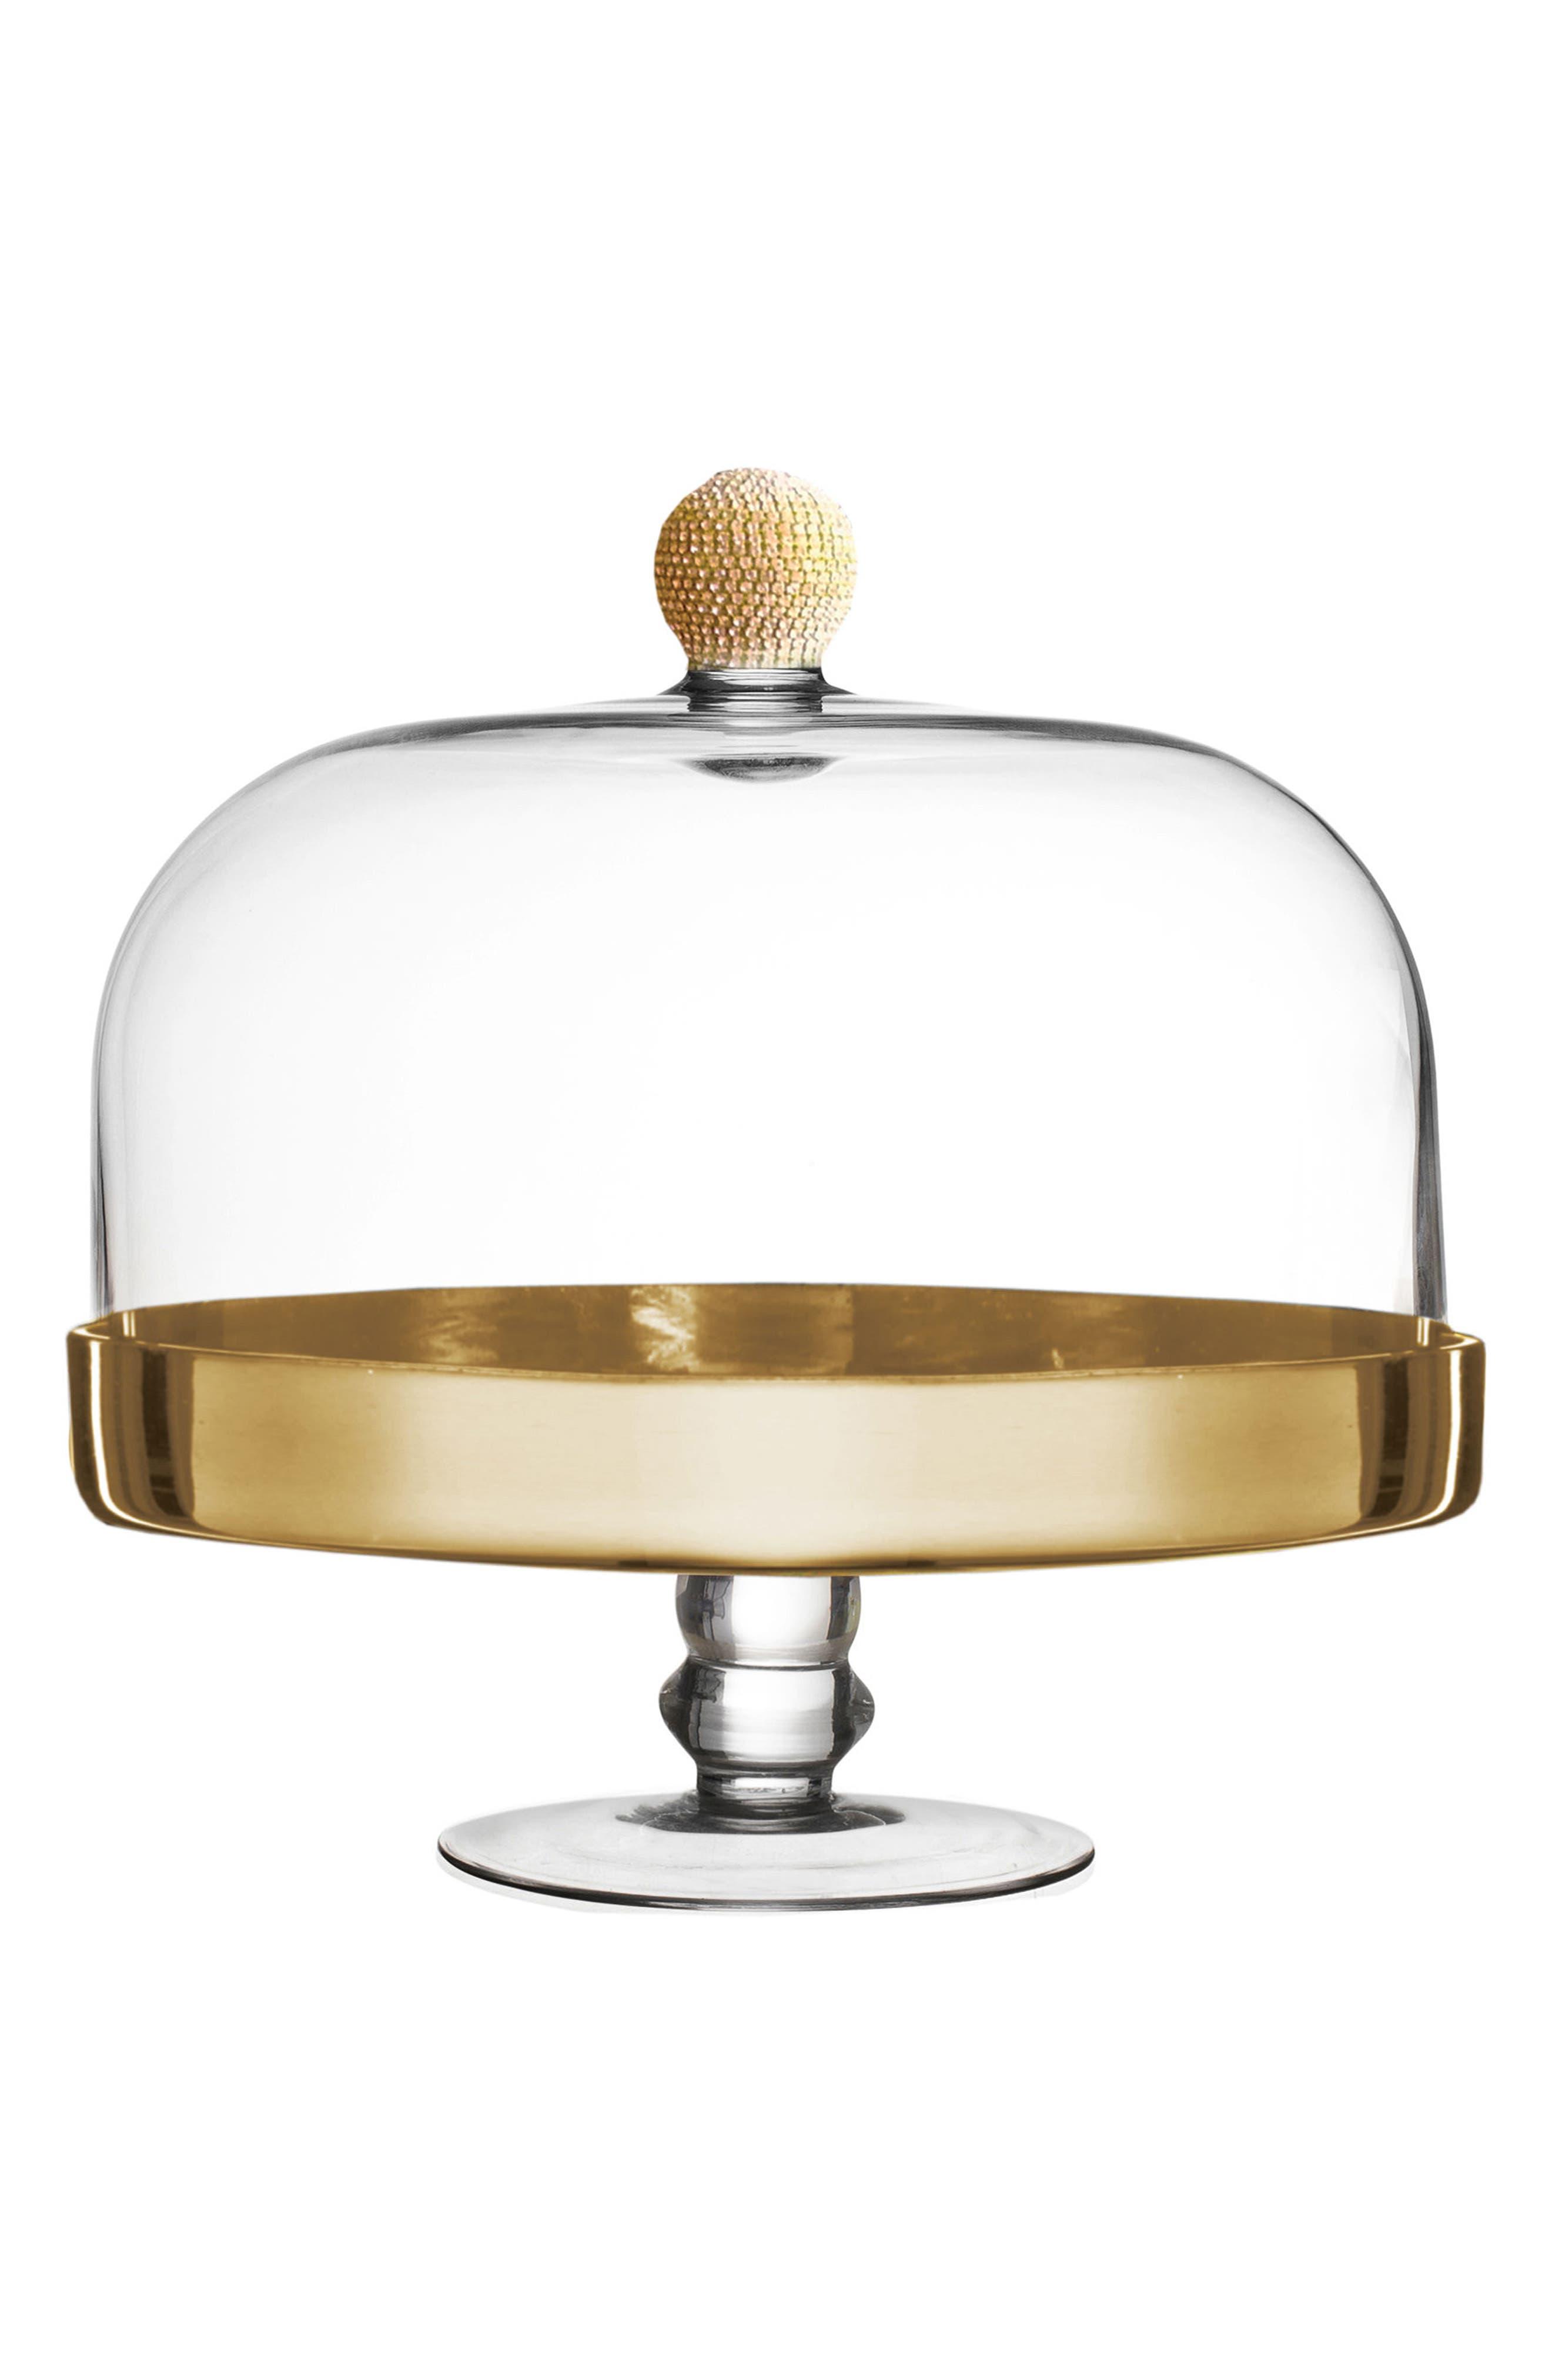 Gold Medley Pedestal Plate & Dome,                         Main,                         color, 710